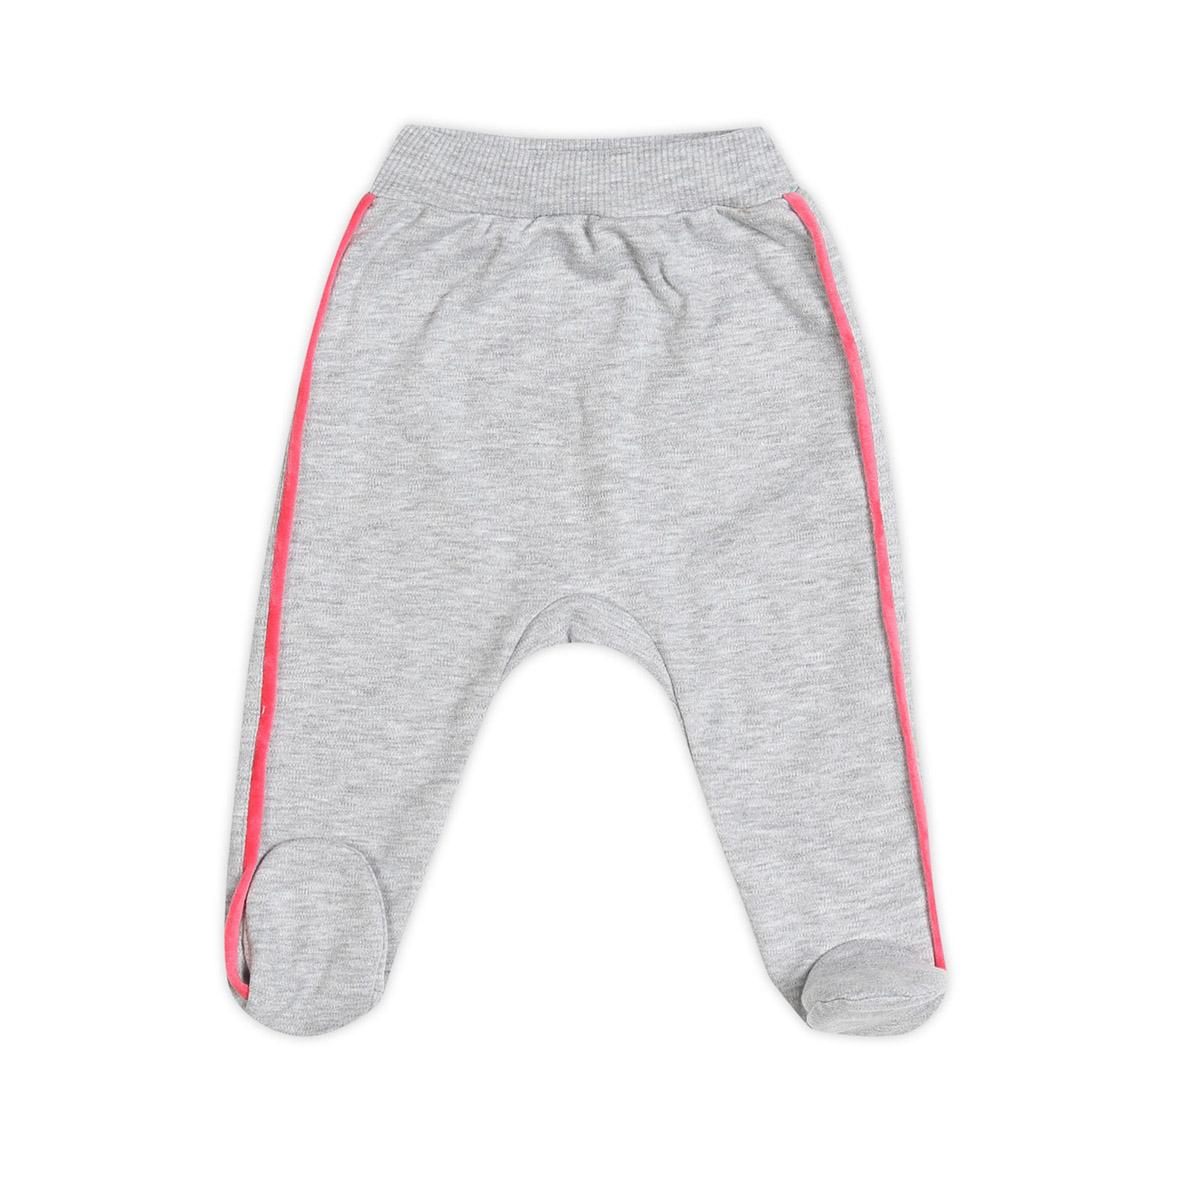 Ползунки с ножками Ёмаё Спорт (26-265) рост 56 серый меланж<br>